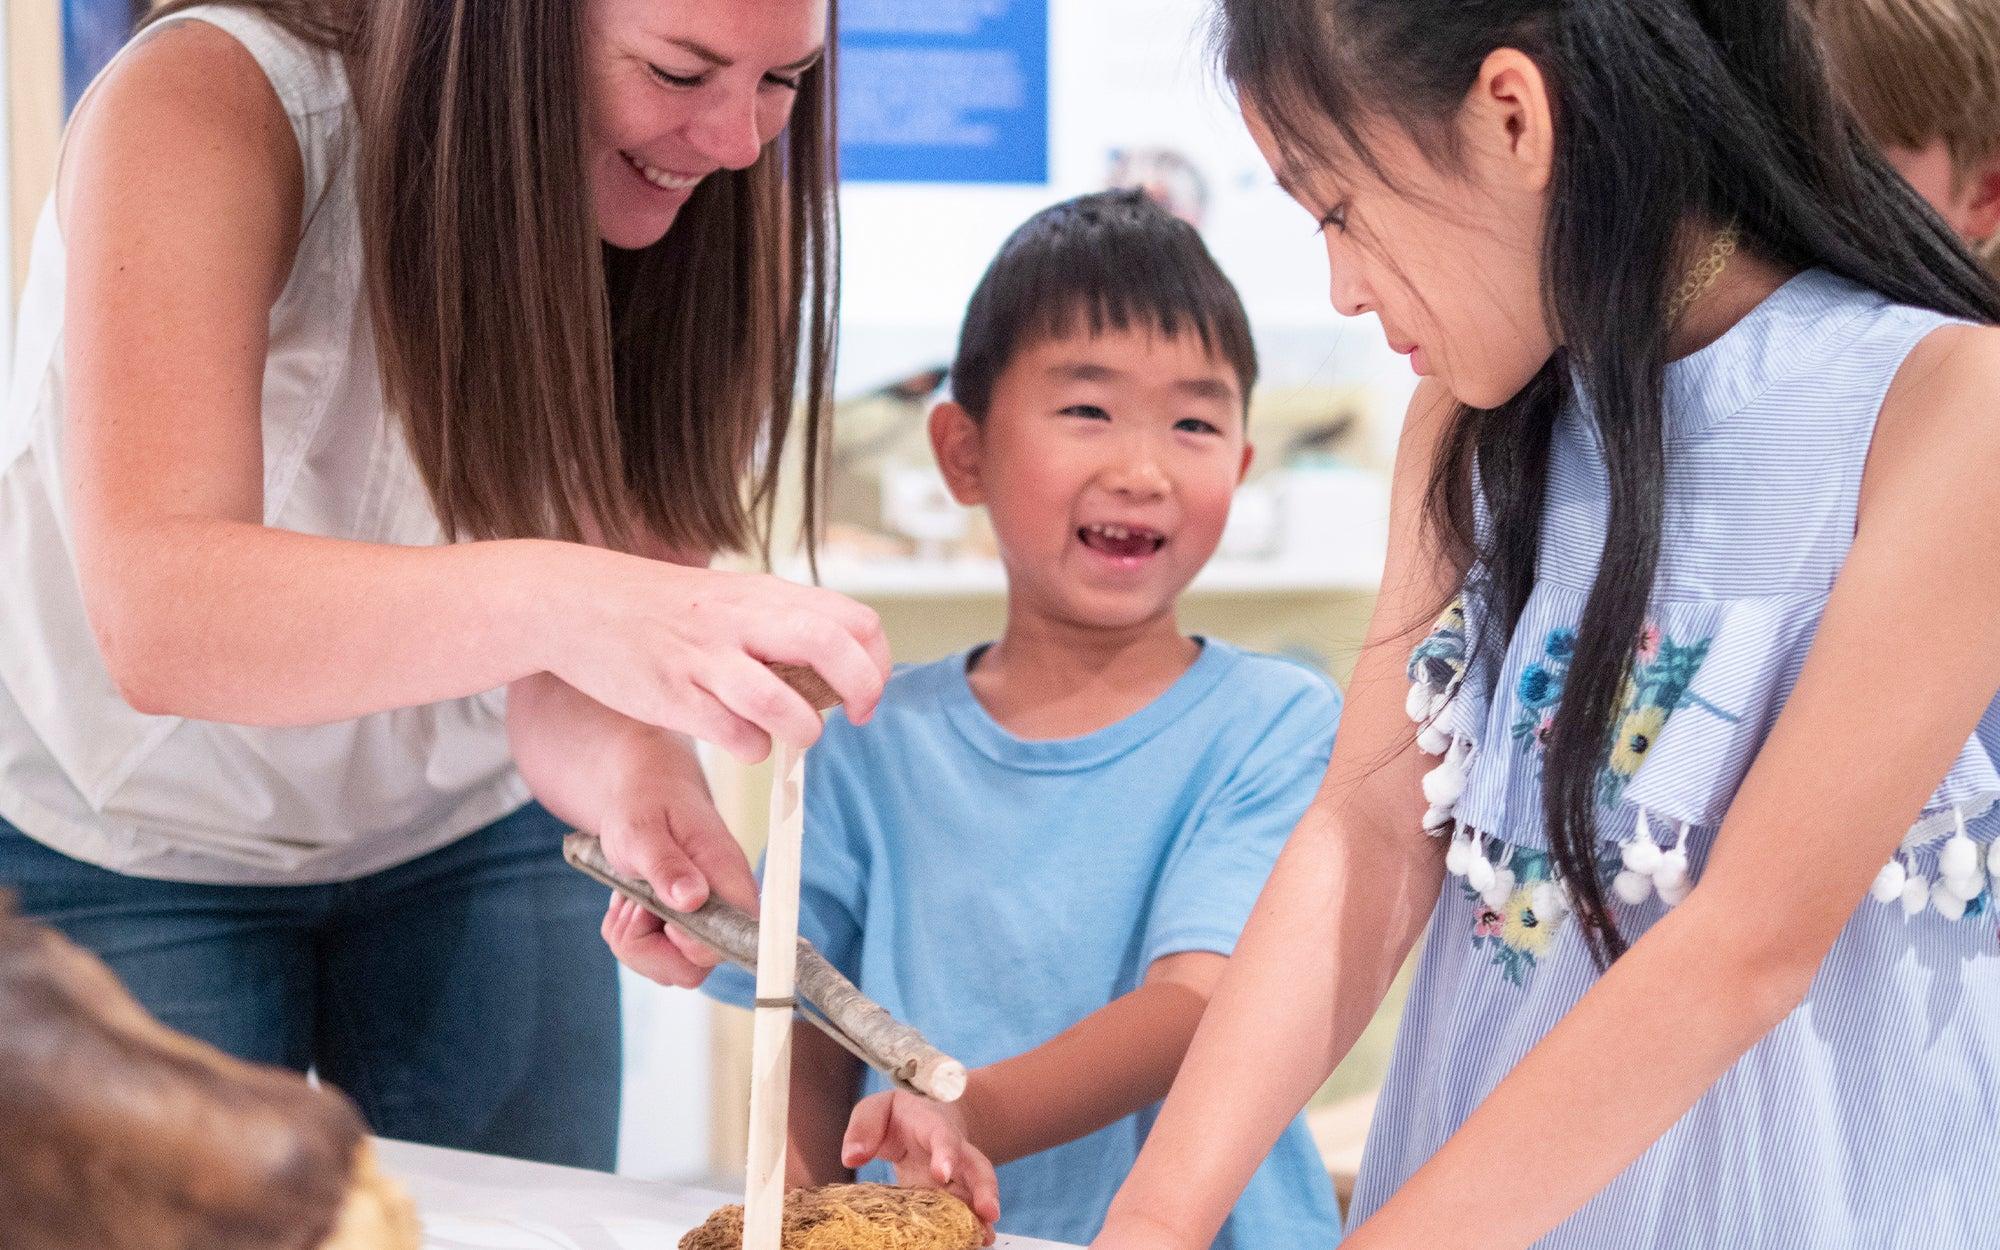 Volunteer helping child